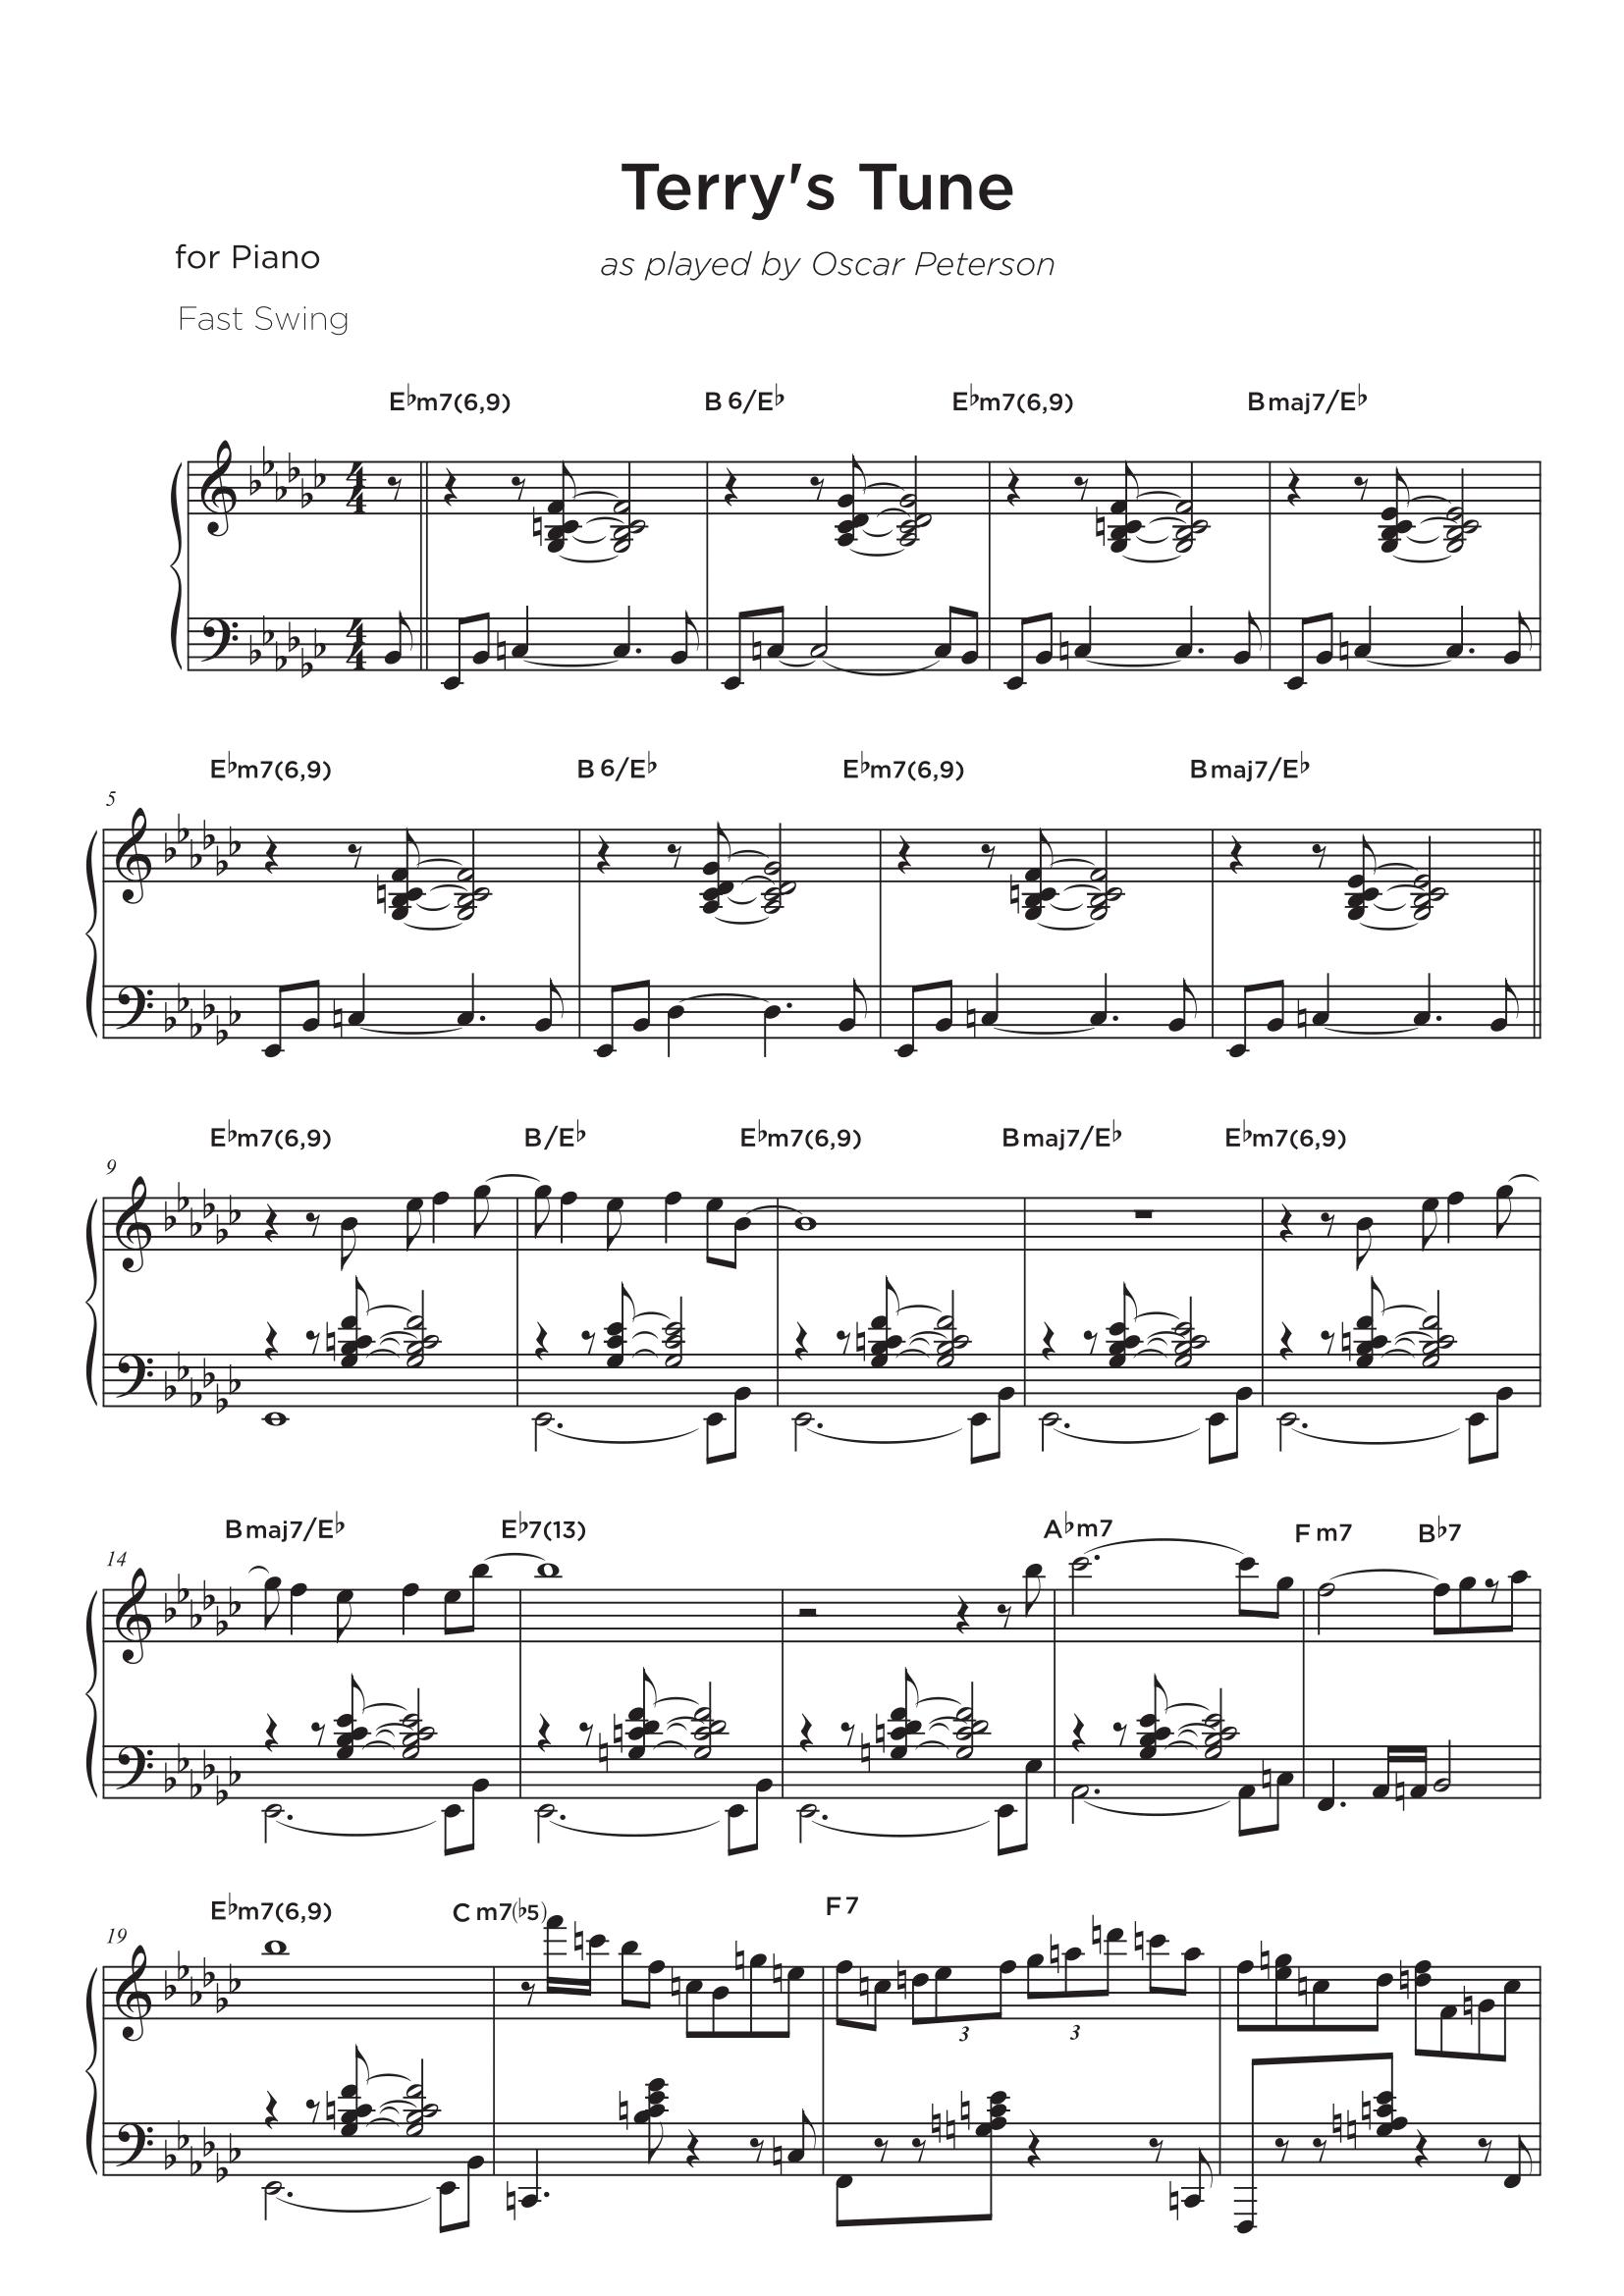 Terry's Tune (as played by Oscar Peterson) - Transcripción de partitura para piano jazz